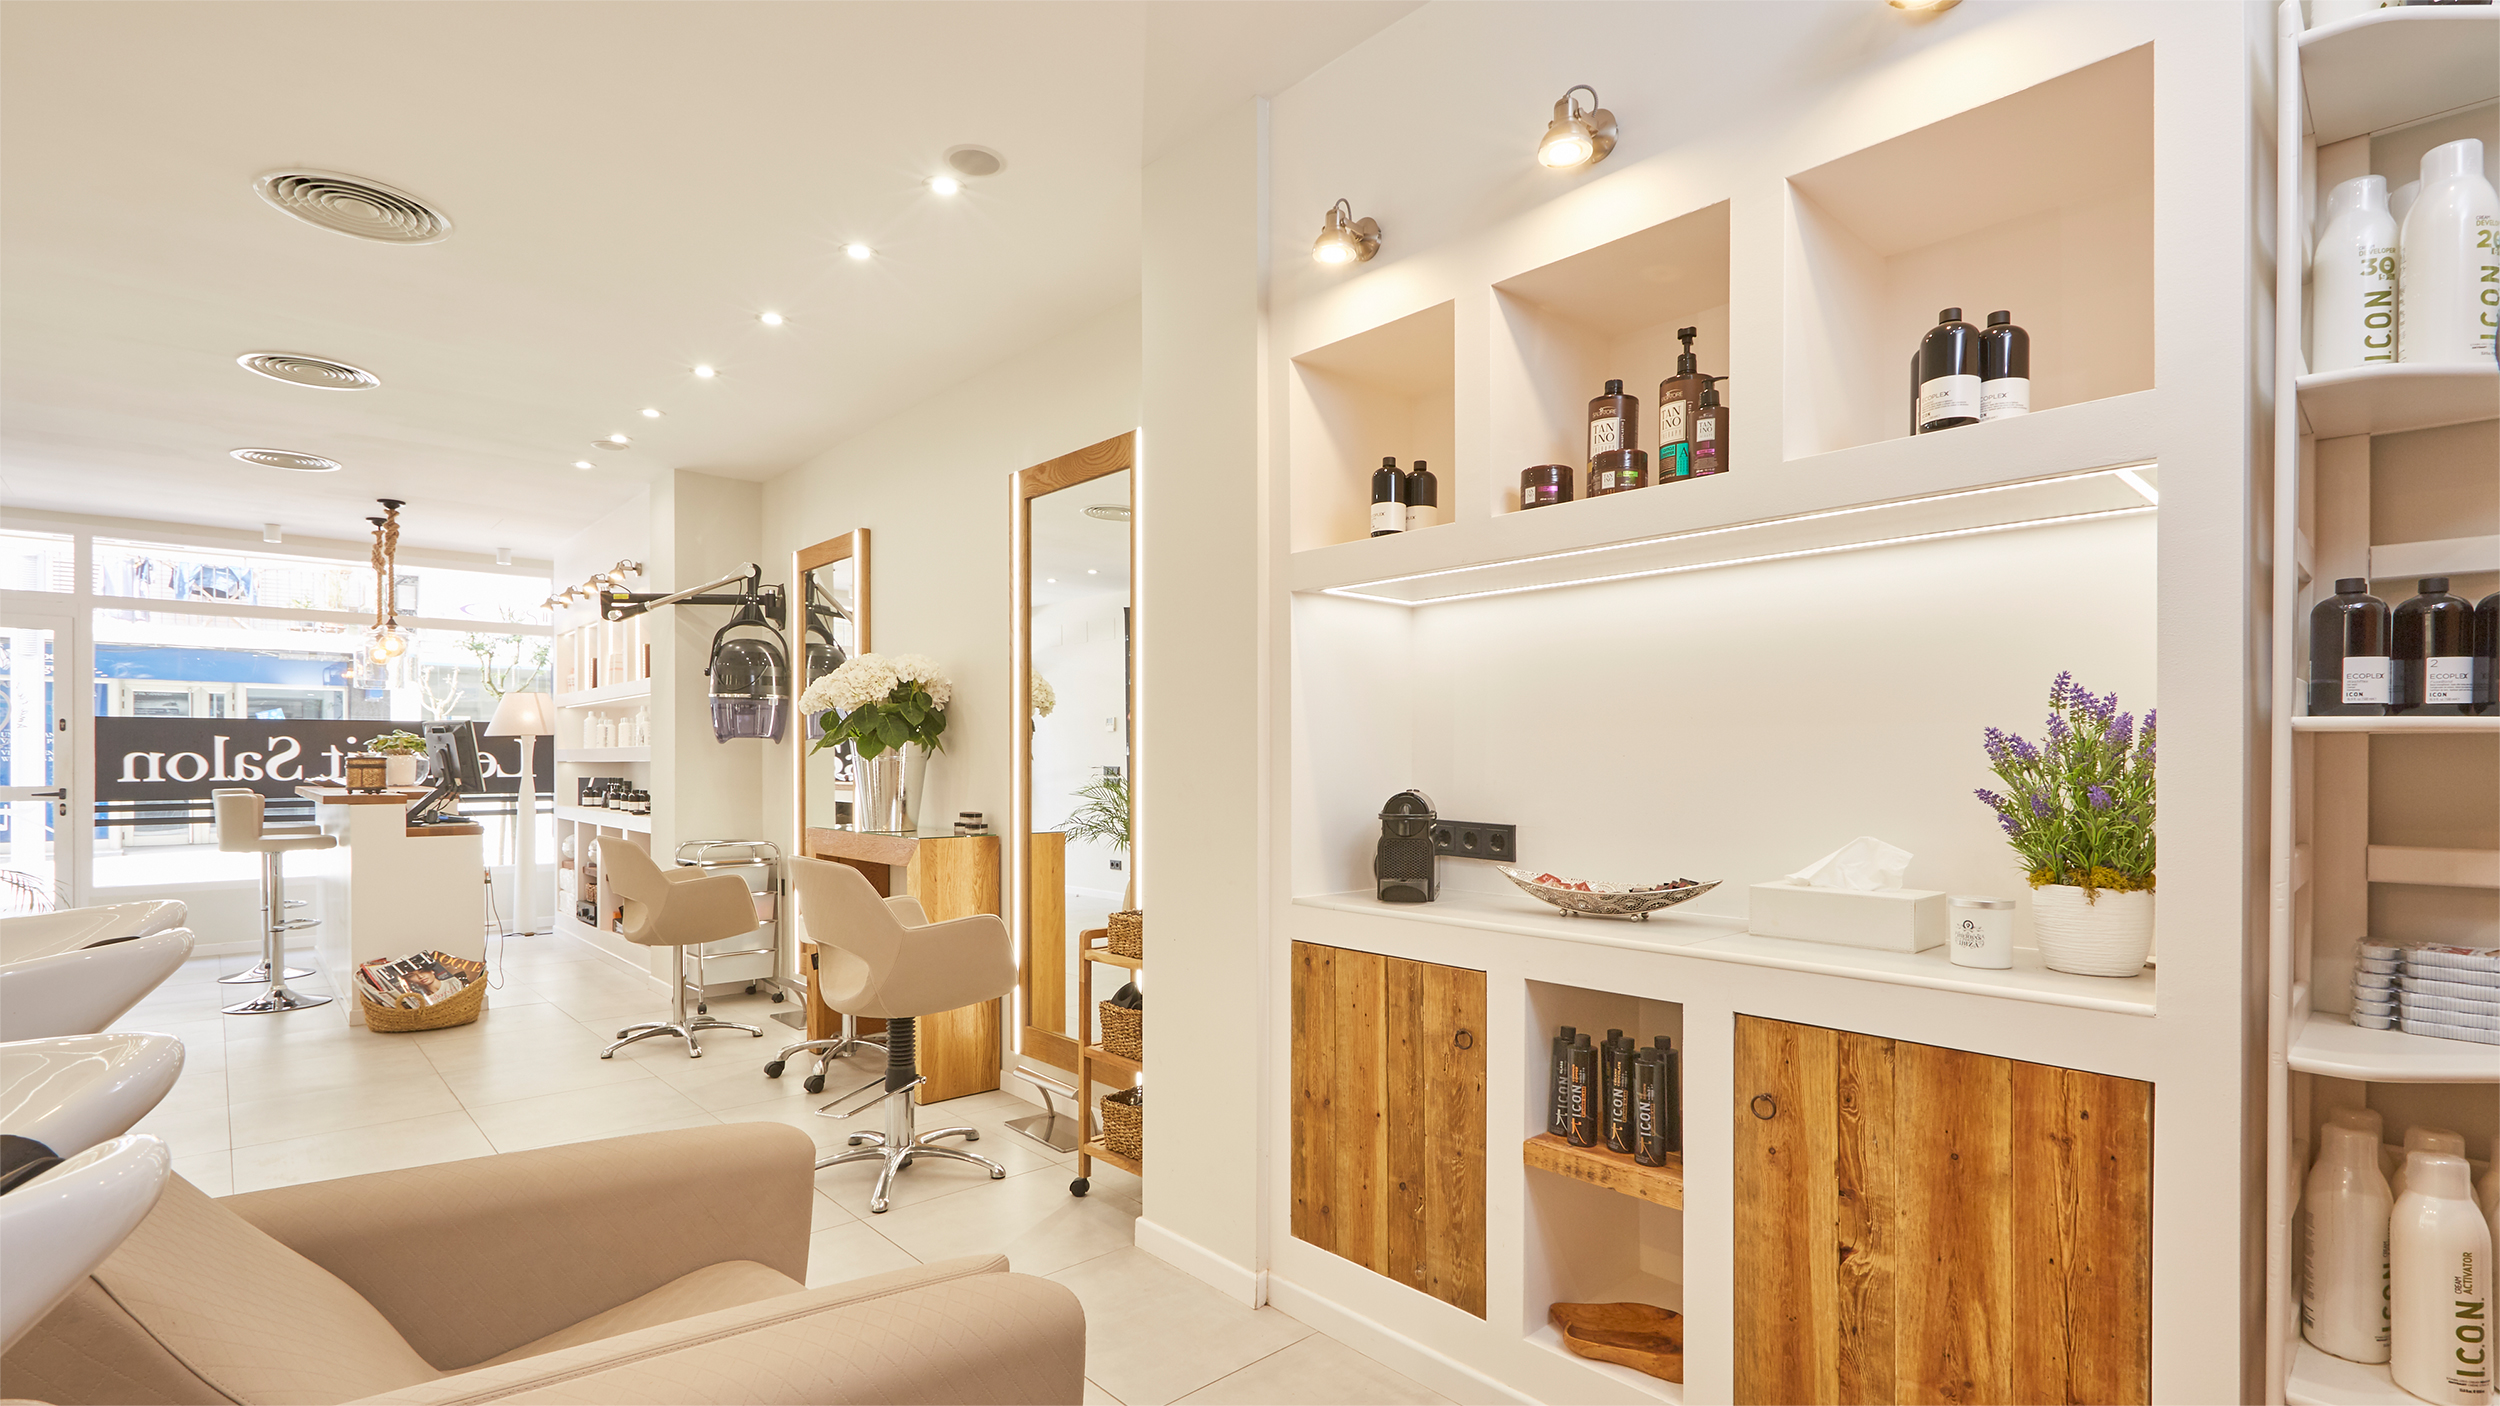 le petit salon ibiza peluquer a y sal n de belleza est tica caballero le petit salon ibiza. Black Bedroom Furniture Sets. Home Design Ideas